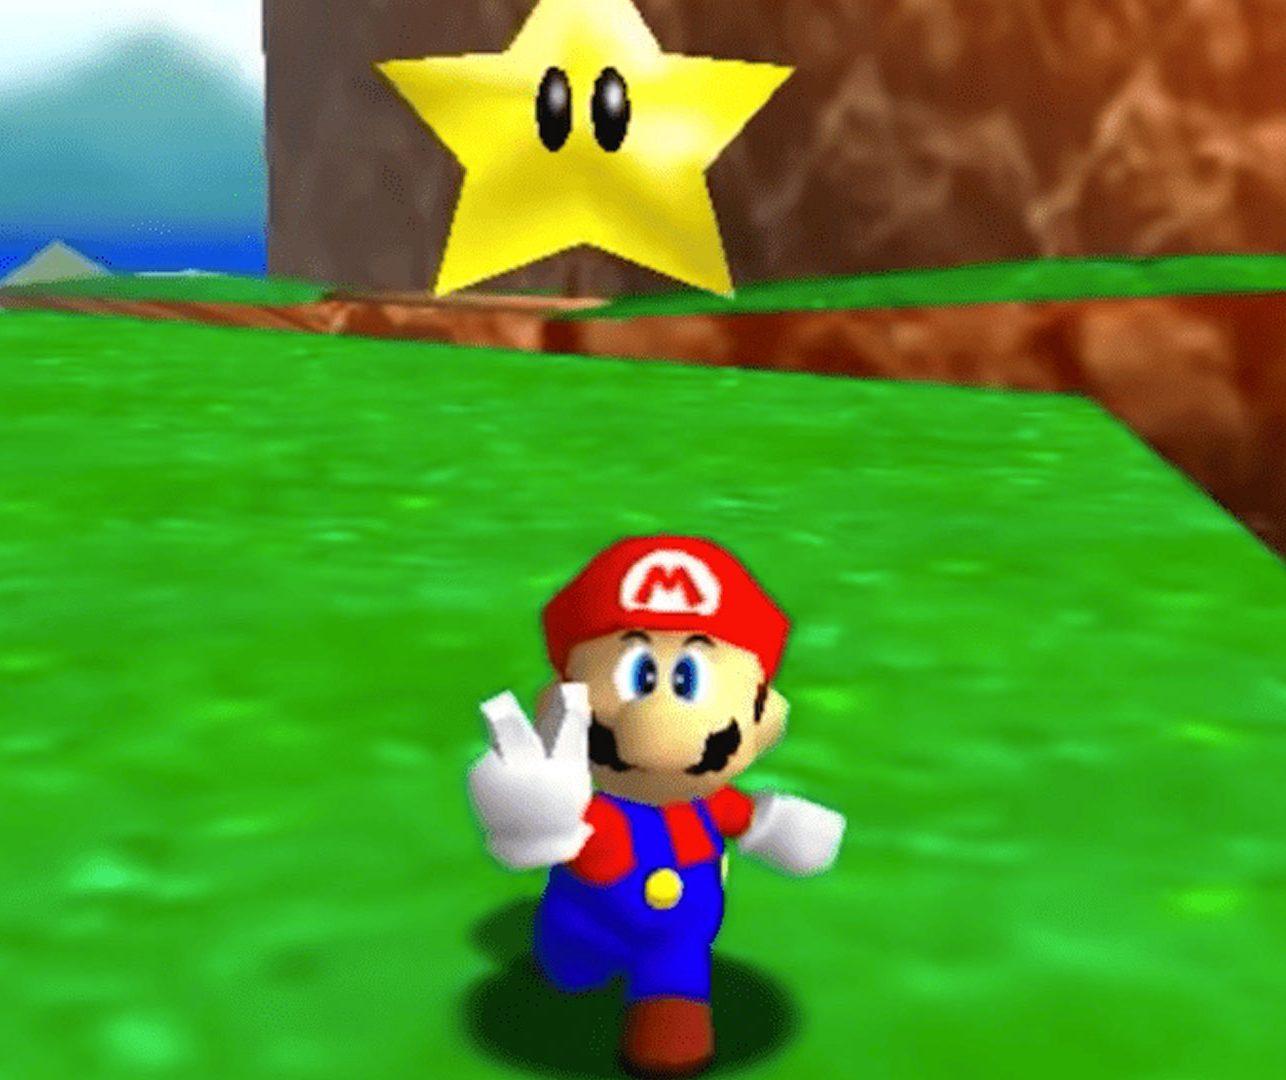 Banner Super Mario 64 Power Star e1605013068987 20 Hidden Levels in Video Games